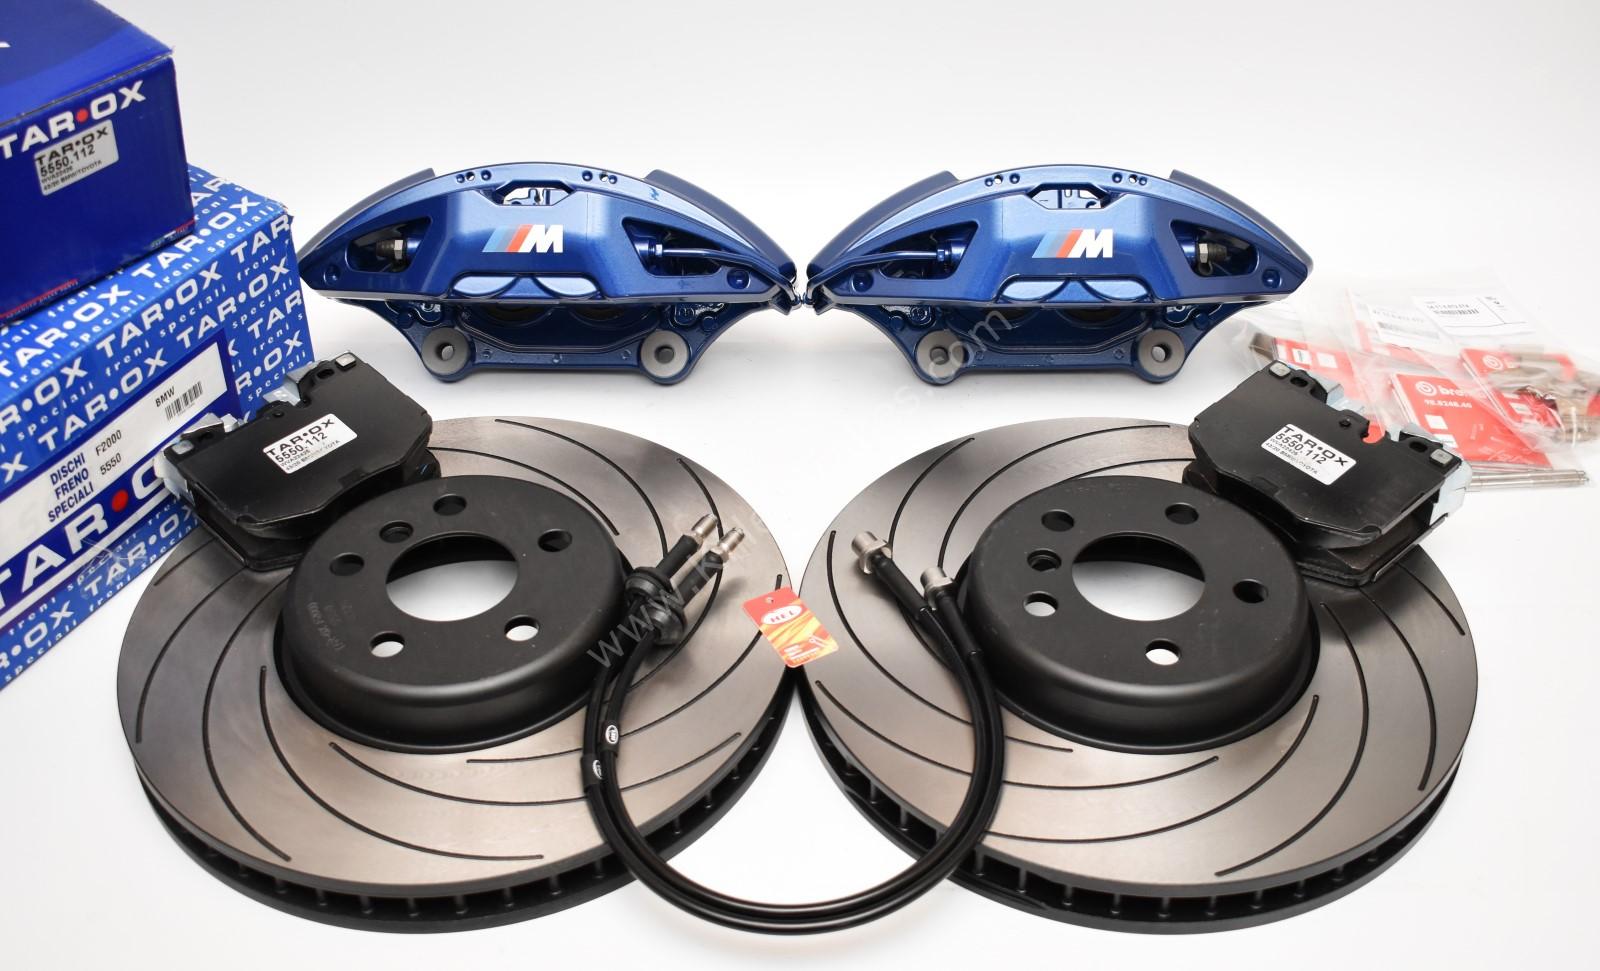 BMW M-Performance G Series Tarox retrofit kit 4pot Brembo 348x36mm G01 G02 G29 G30 G31 G11 G01 G02 G05 New